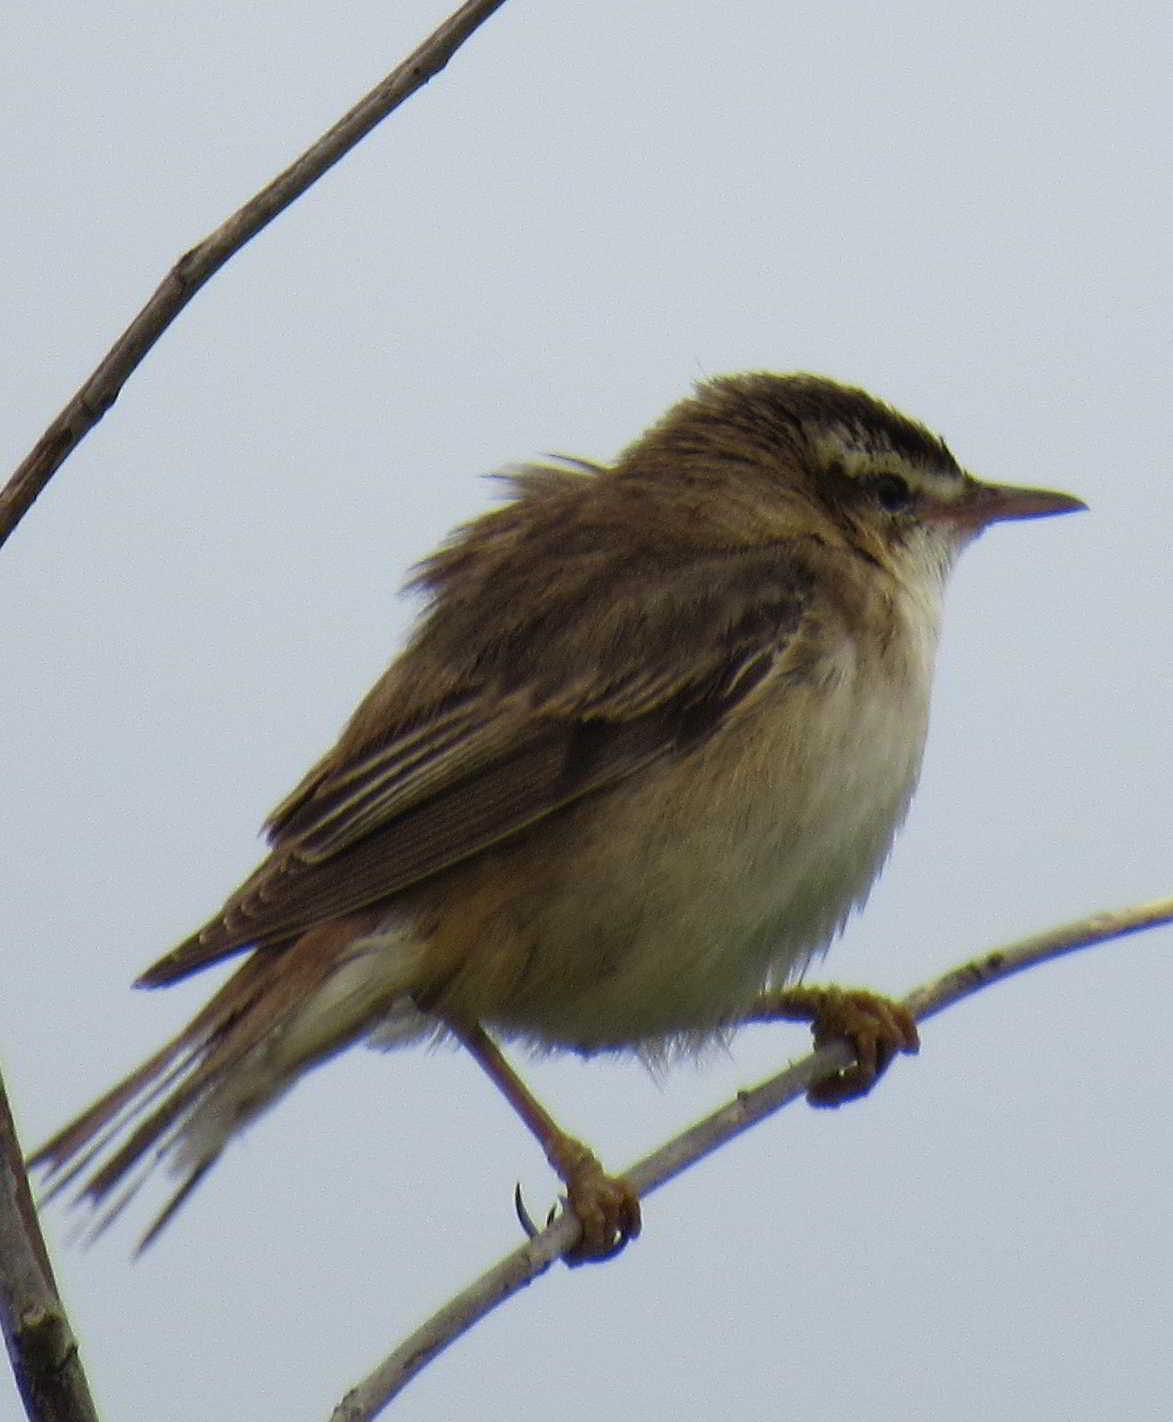 Reed warbler EastHaven